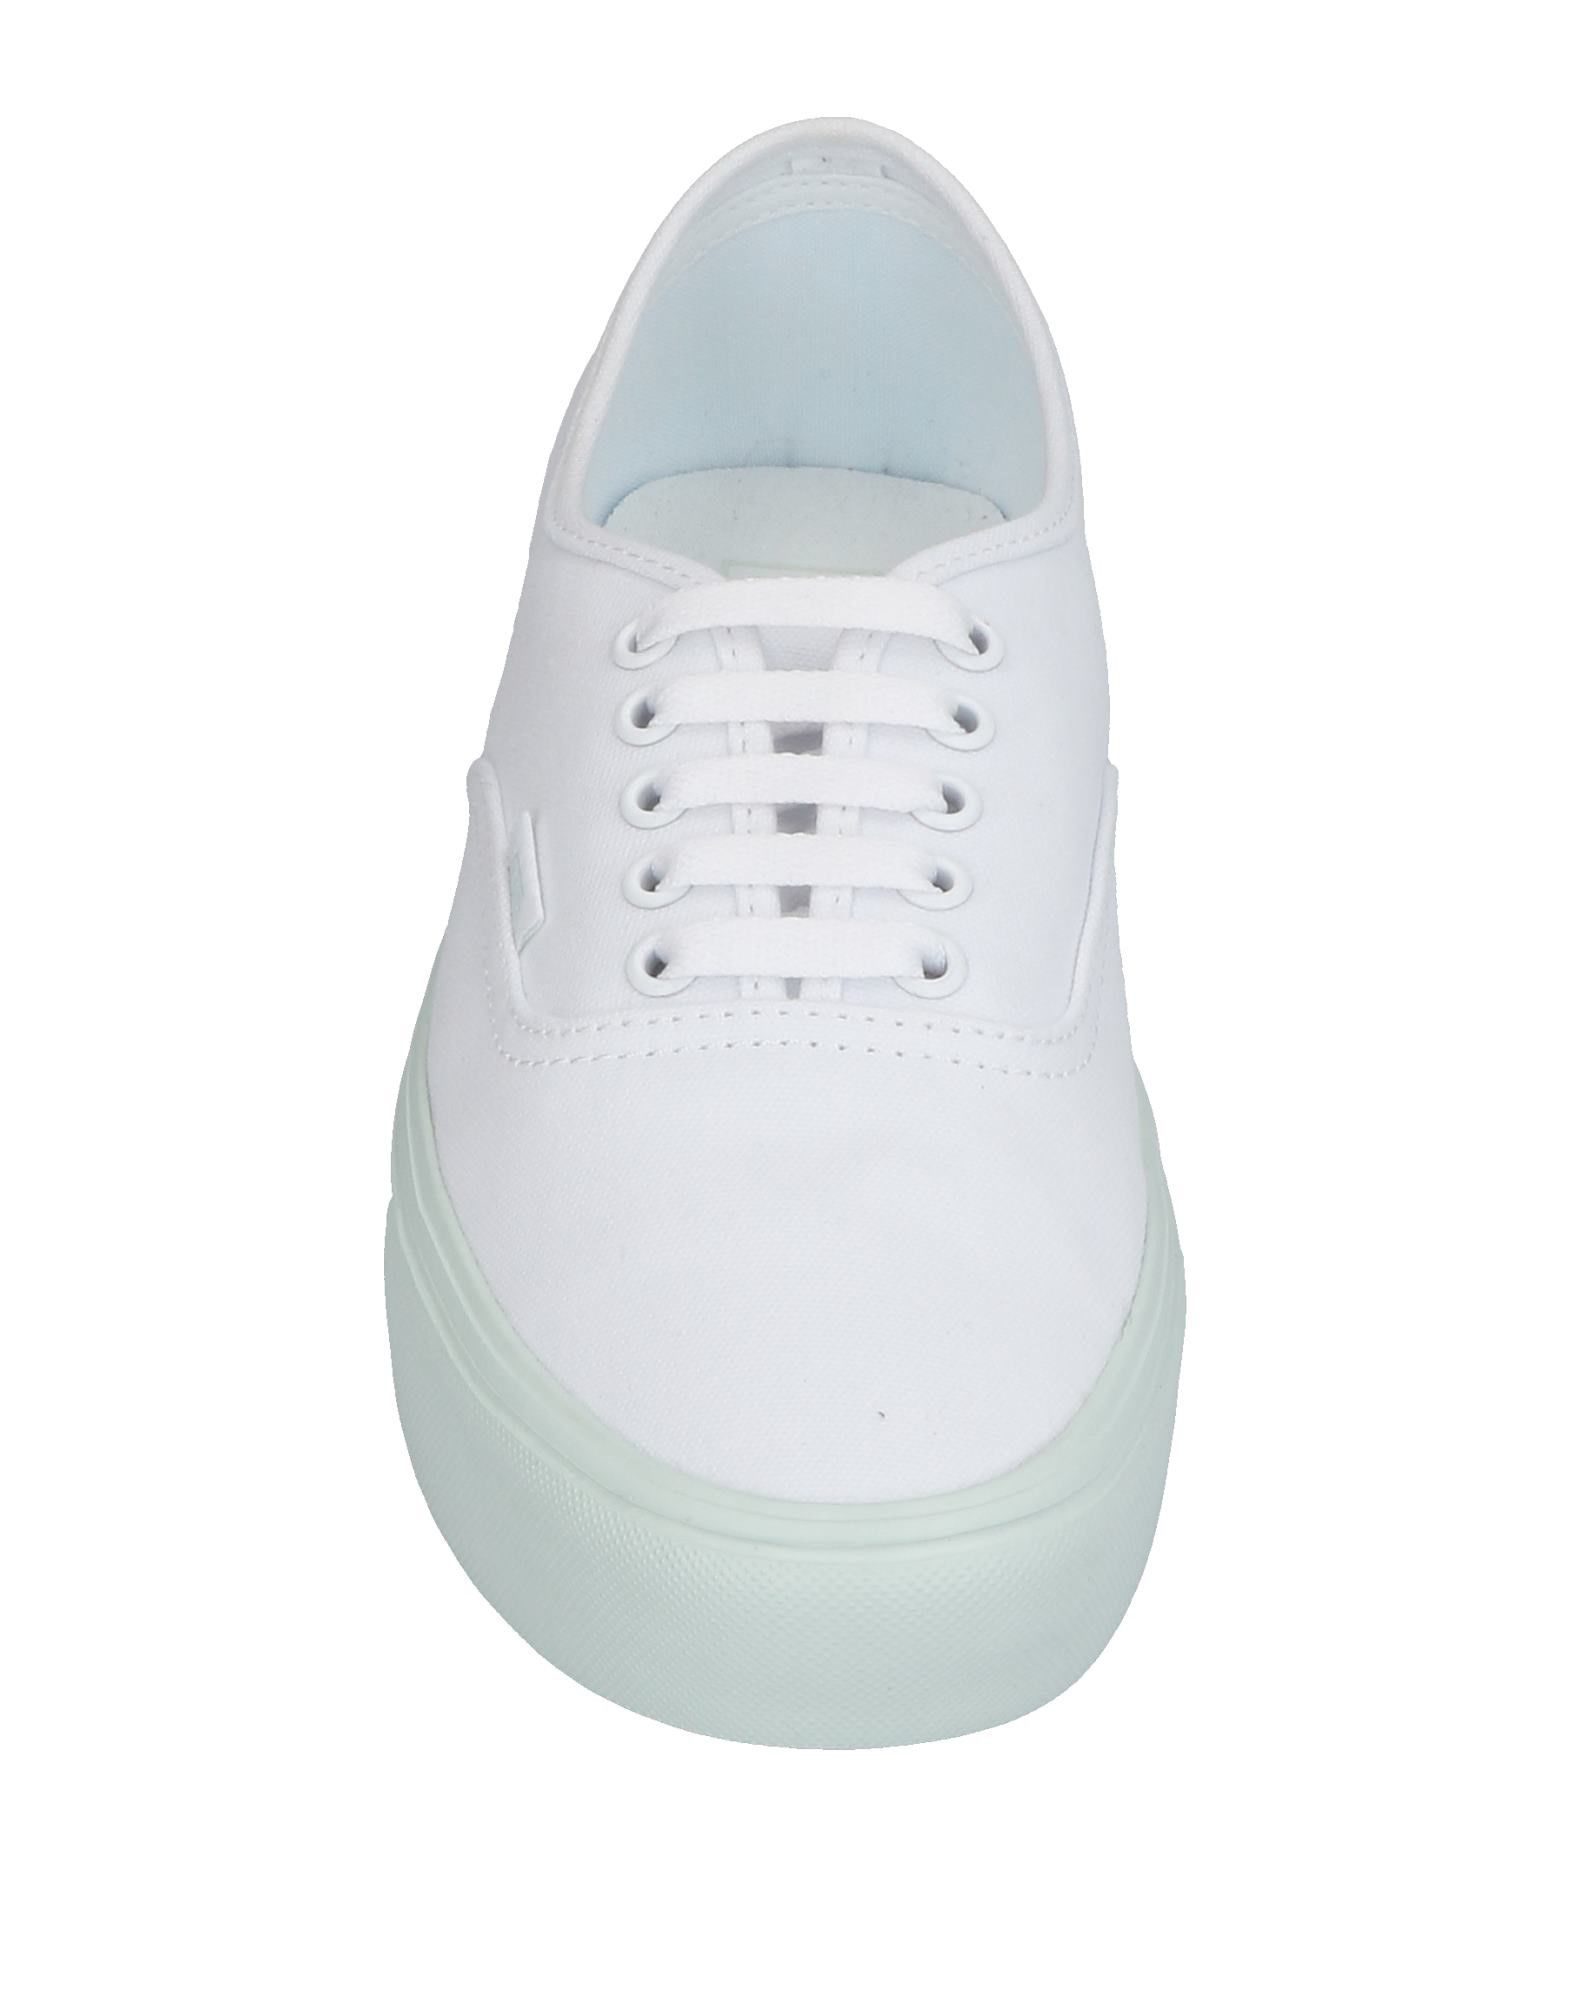 Moda Sneakers Vans Uomo - 11429324TI